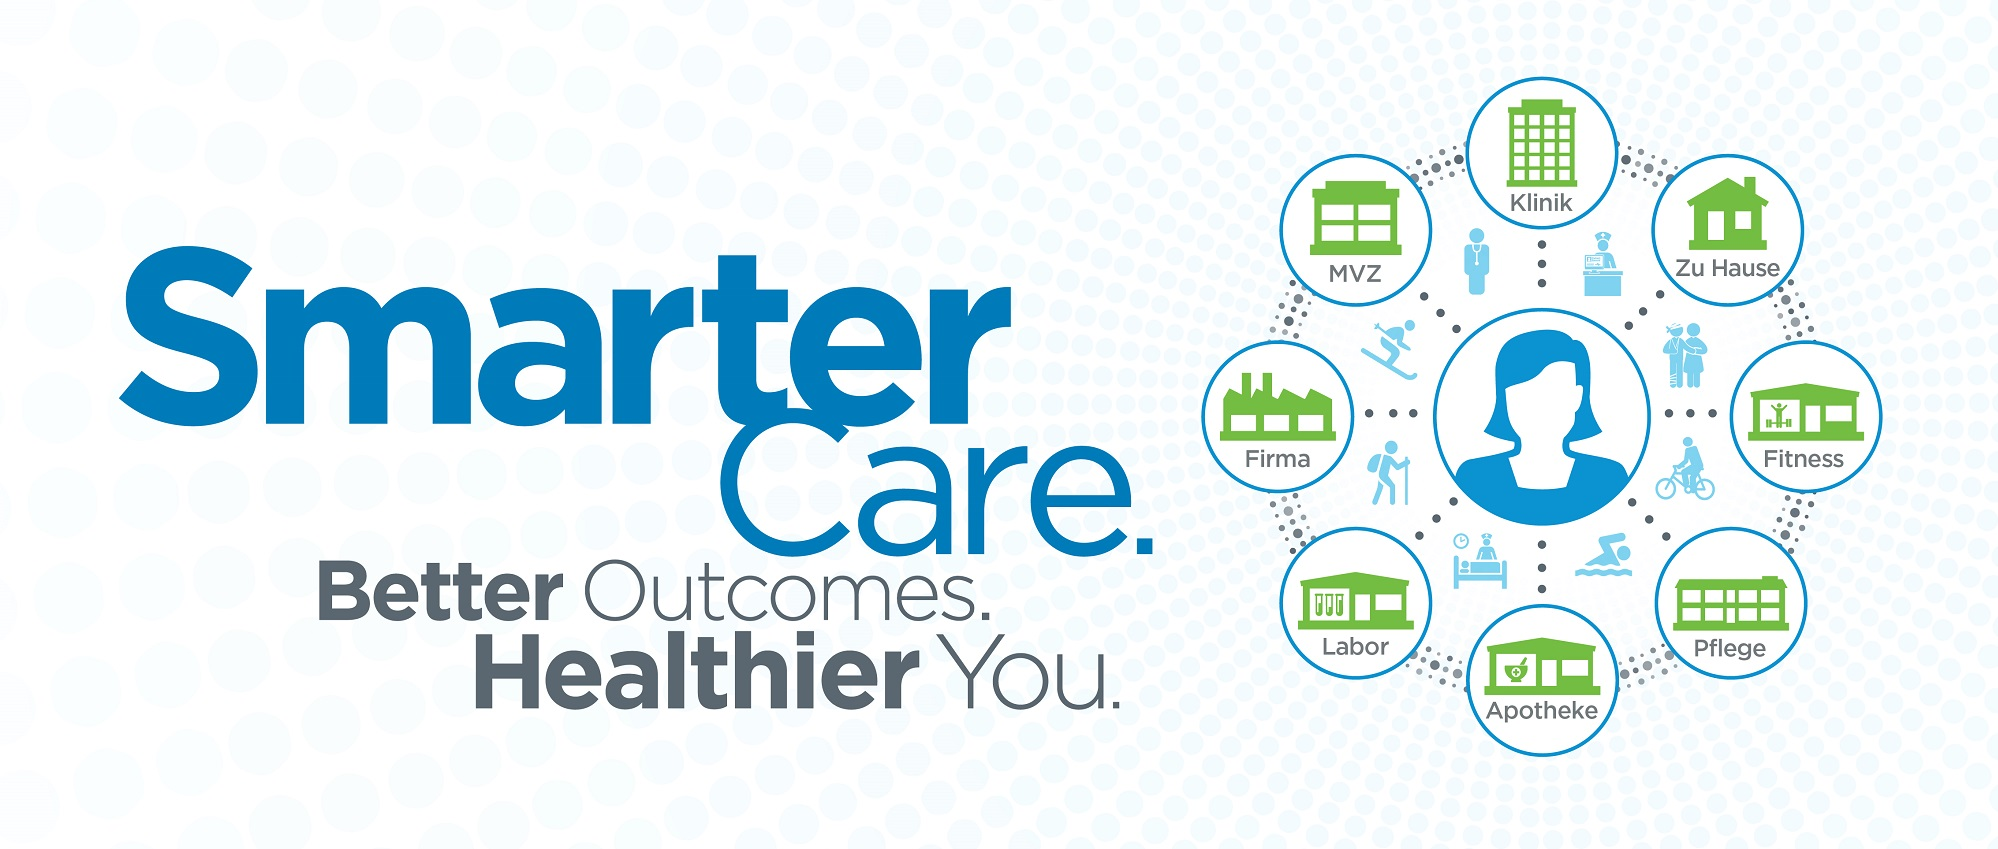 Smarter Care. Better Outcomes. Healthier You.